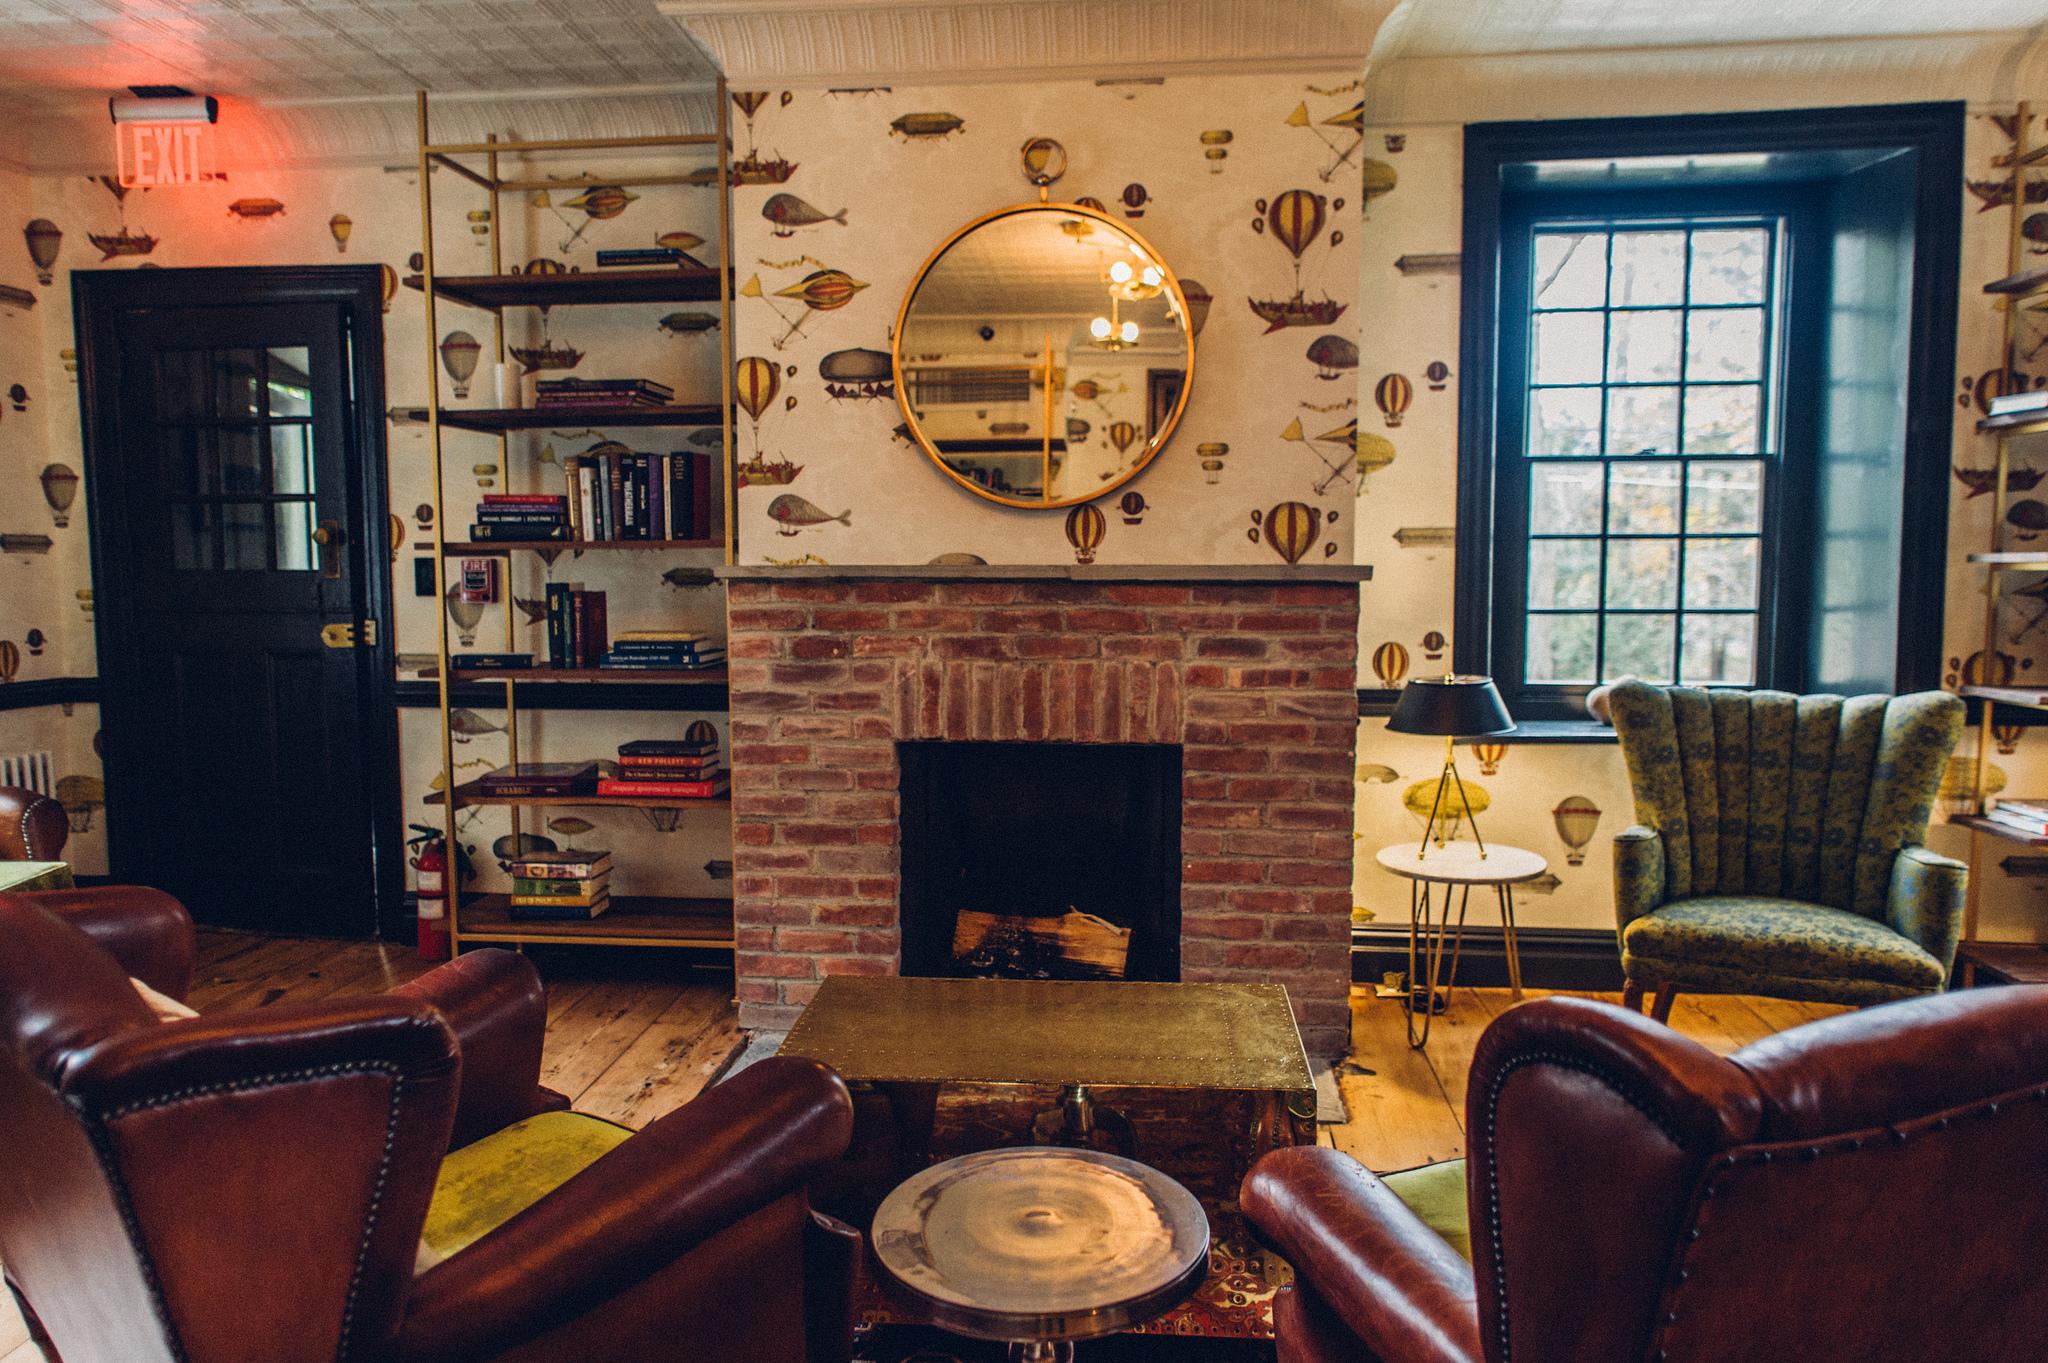 hasbrouck house - catskills upstatenew york